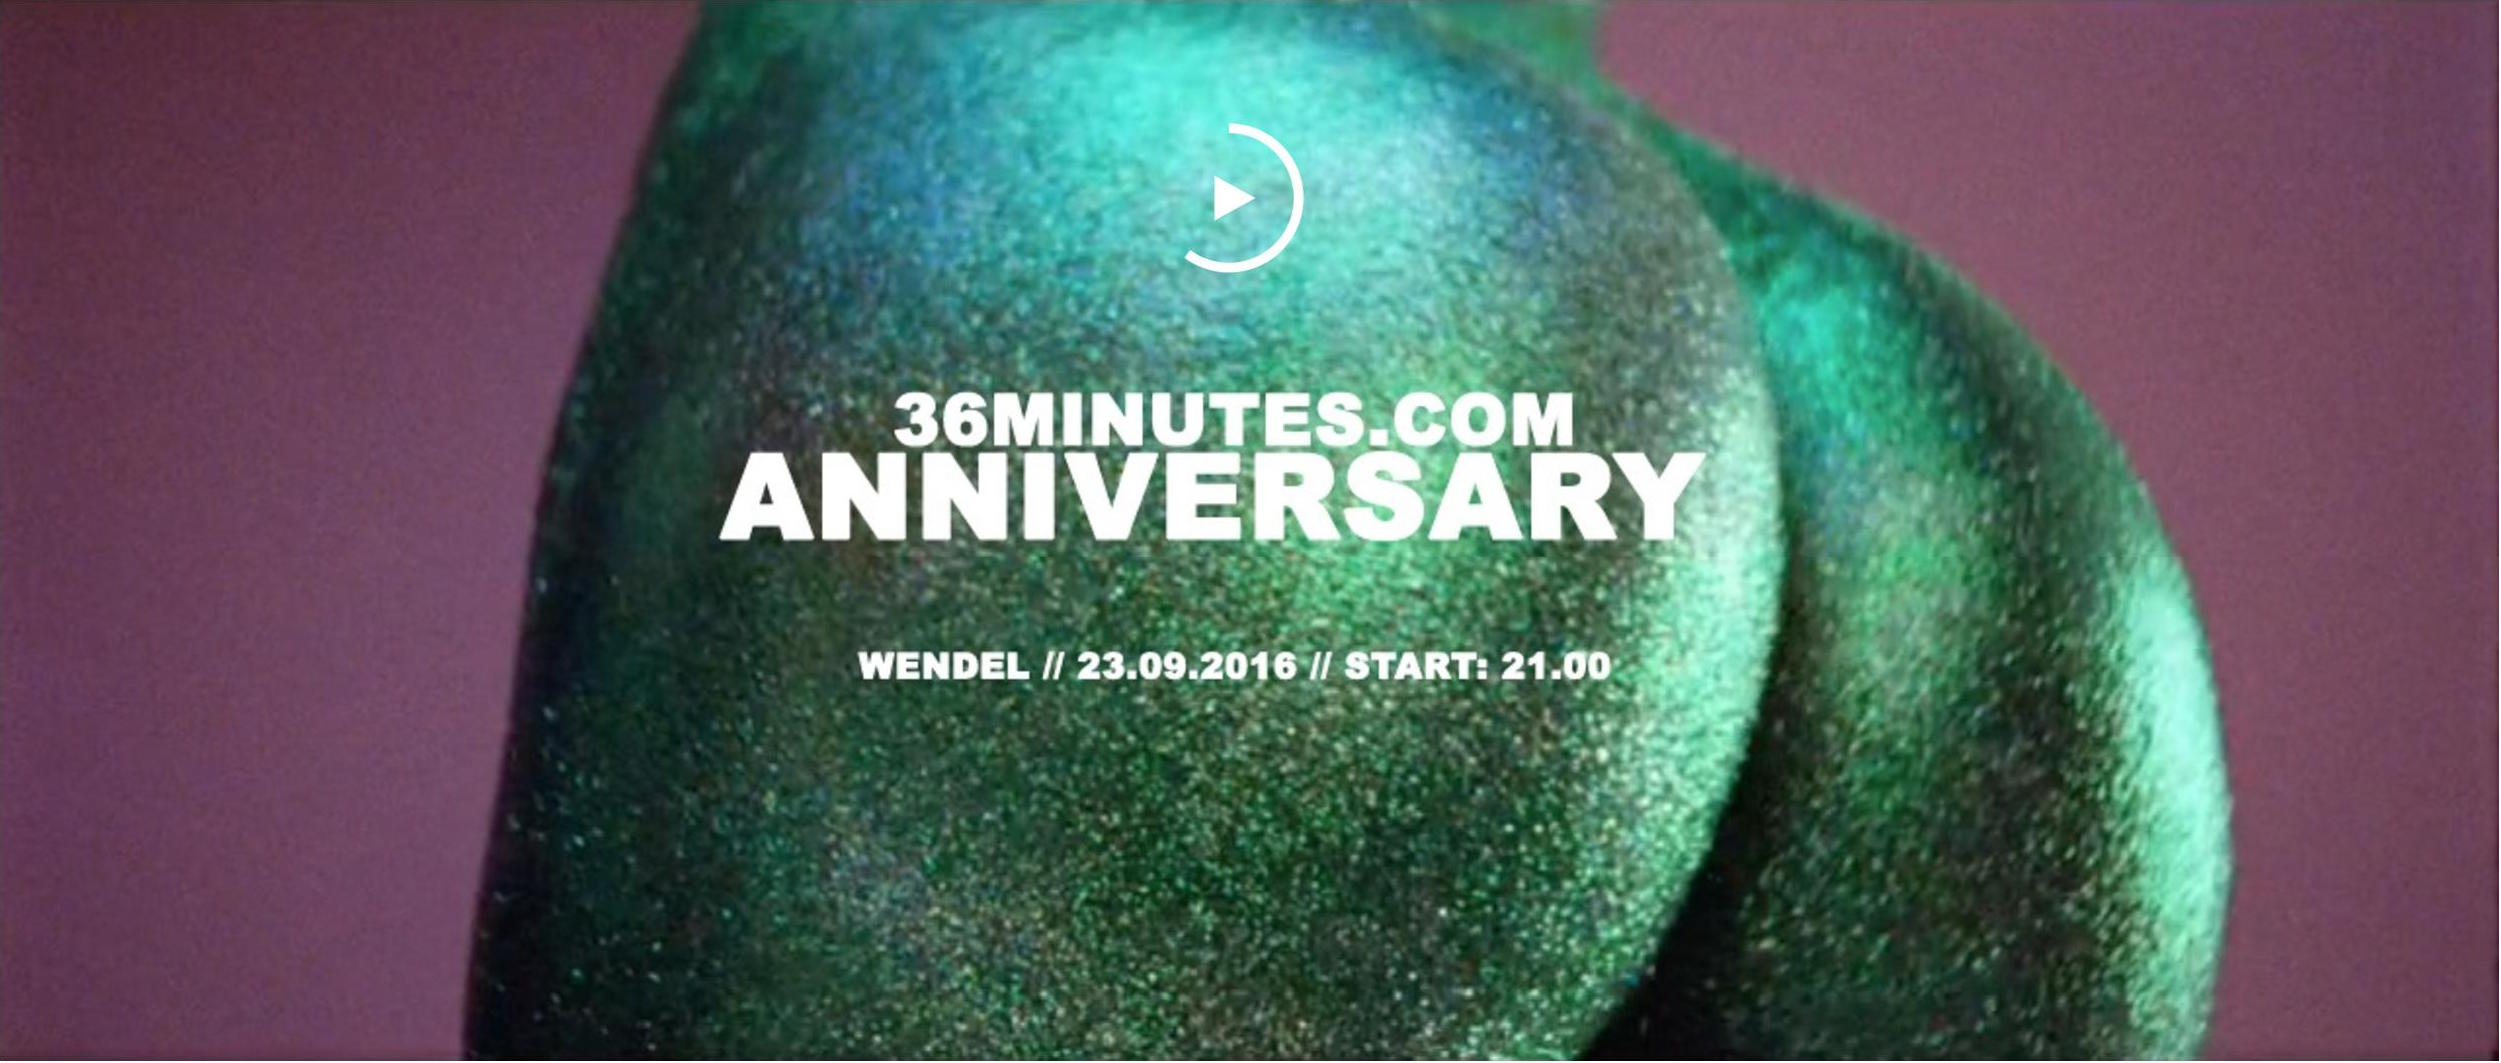 36minutes-anniversary-flyer